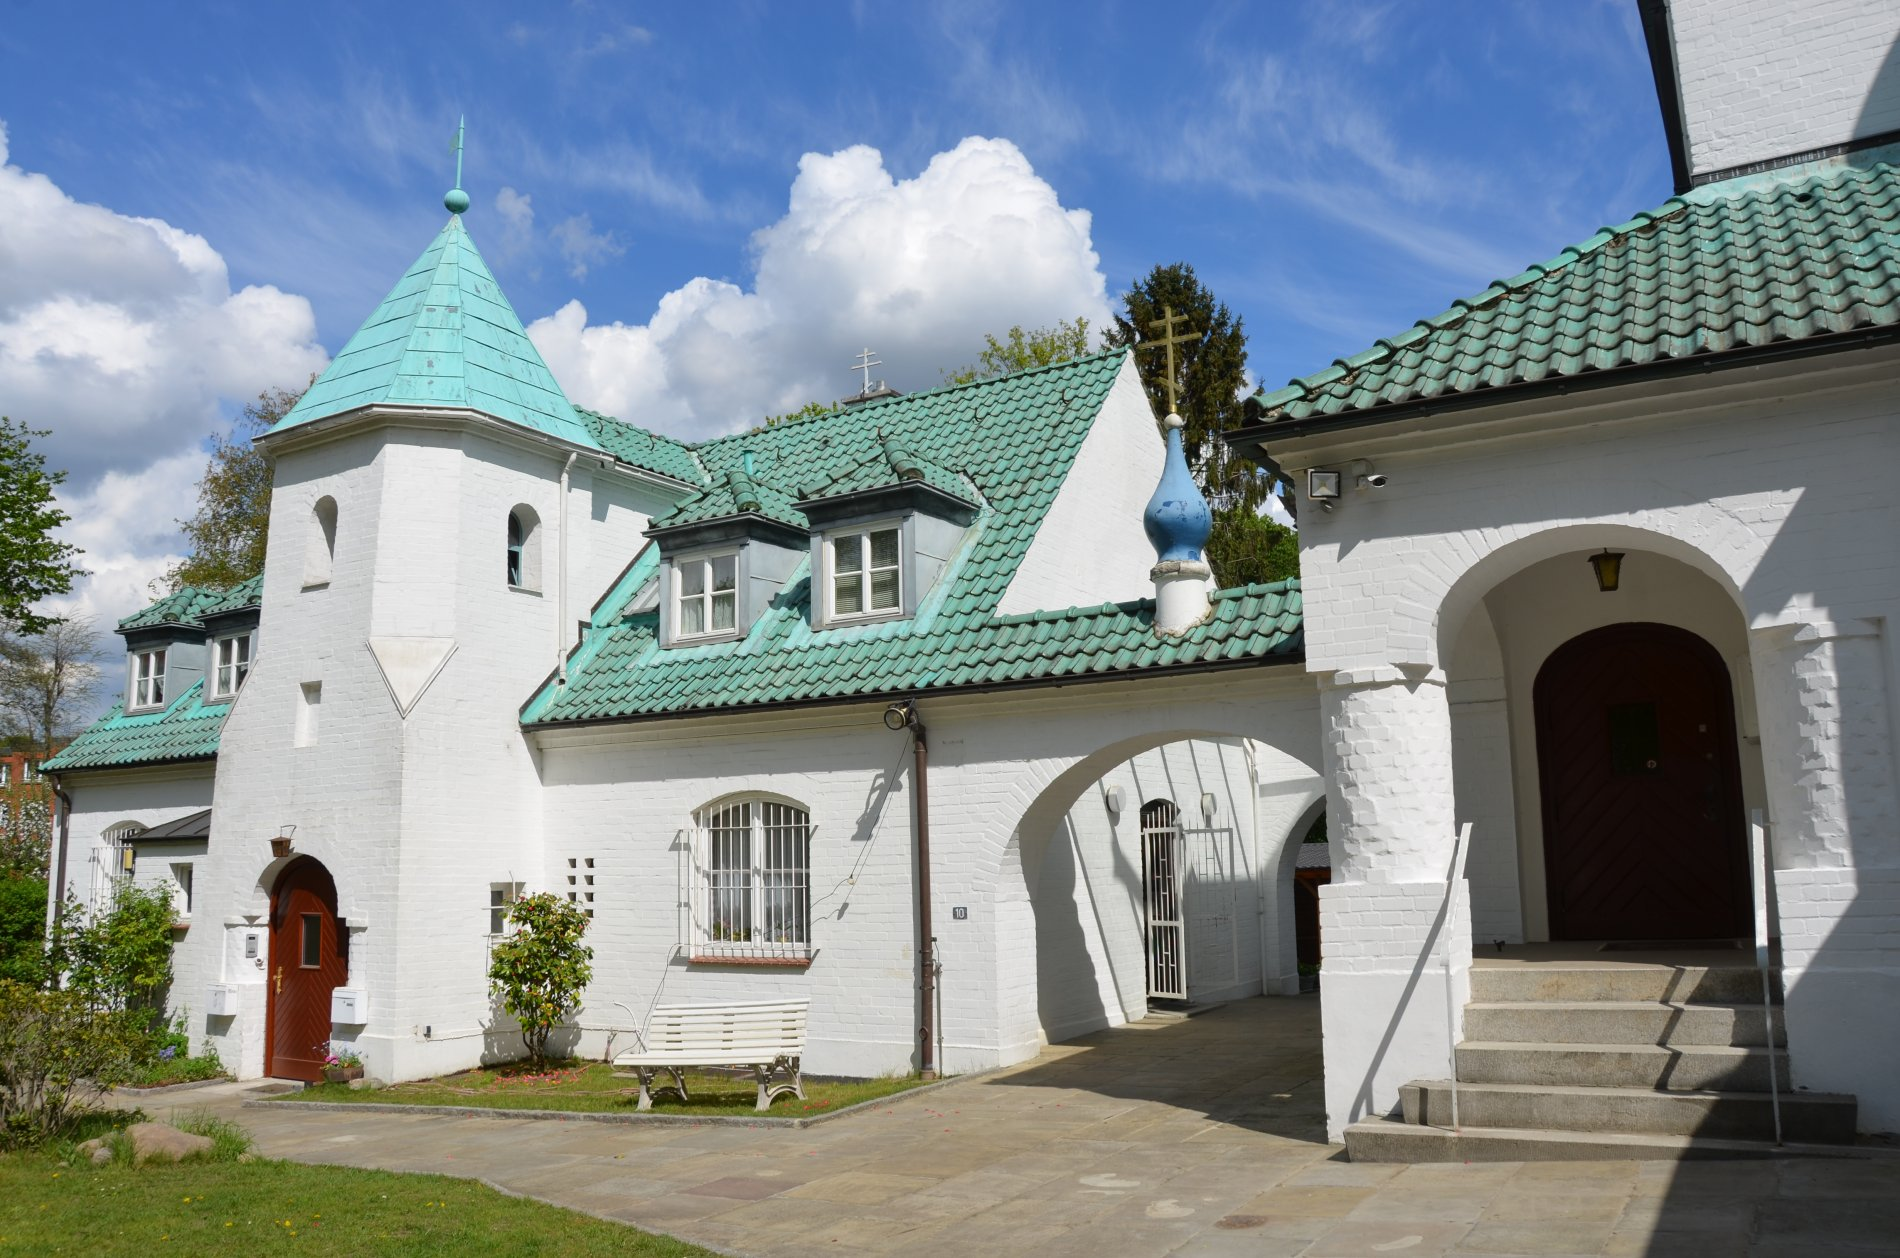 Russisch Orthodoxe Kirche Nebengebäude